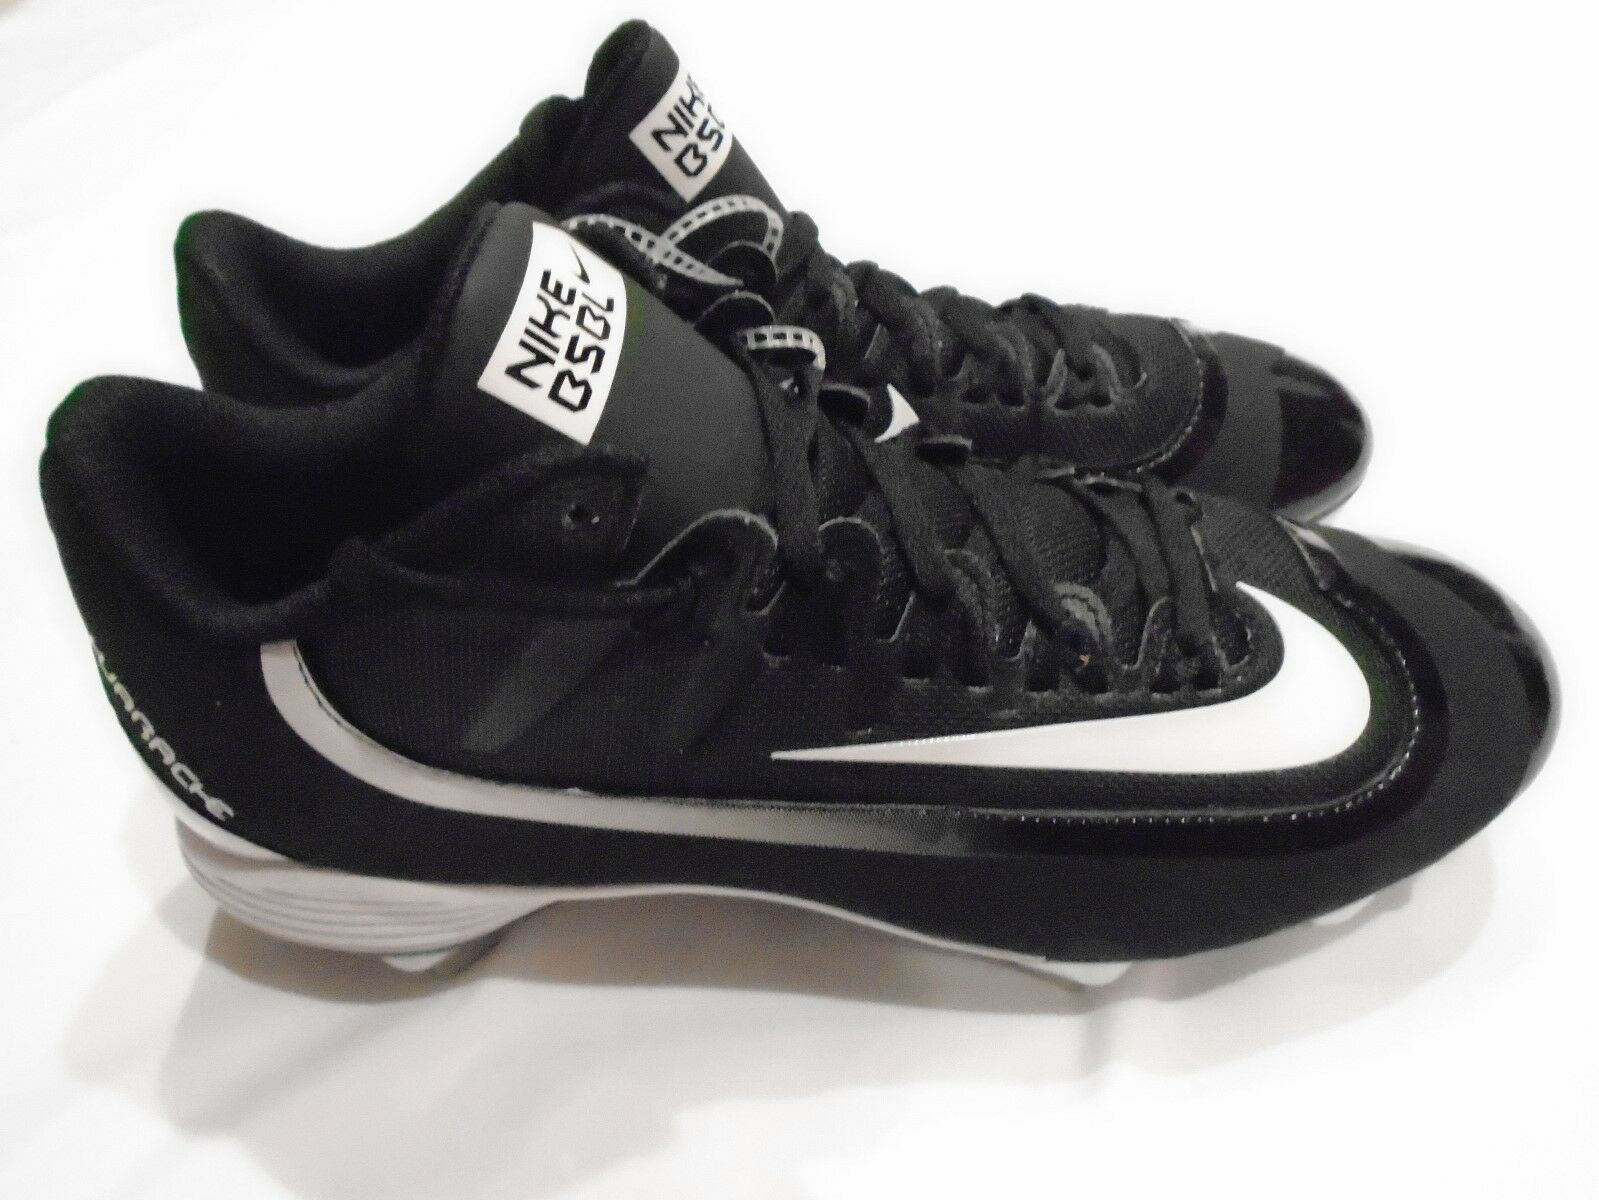 Nike maschile di aria nuova huarache 2k sporcizia (metà metal scarpe da baseball